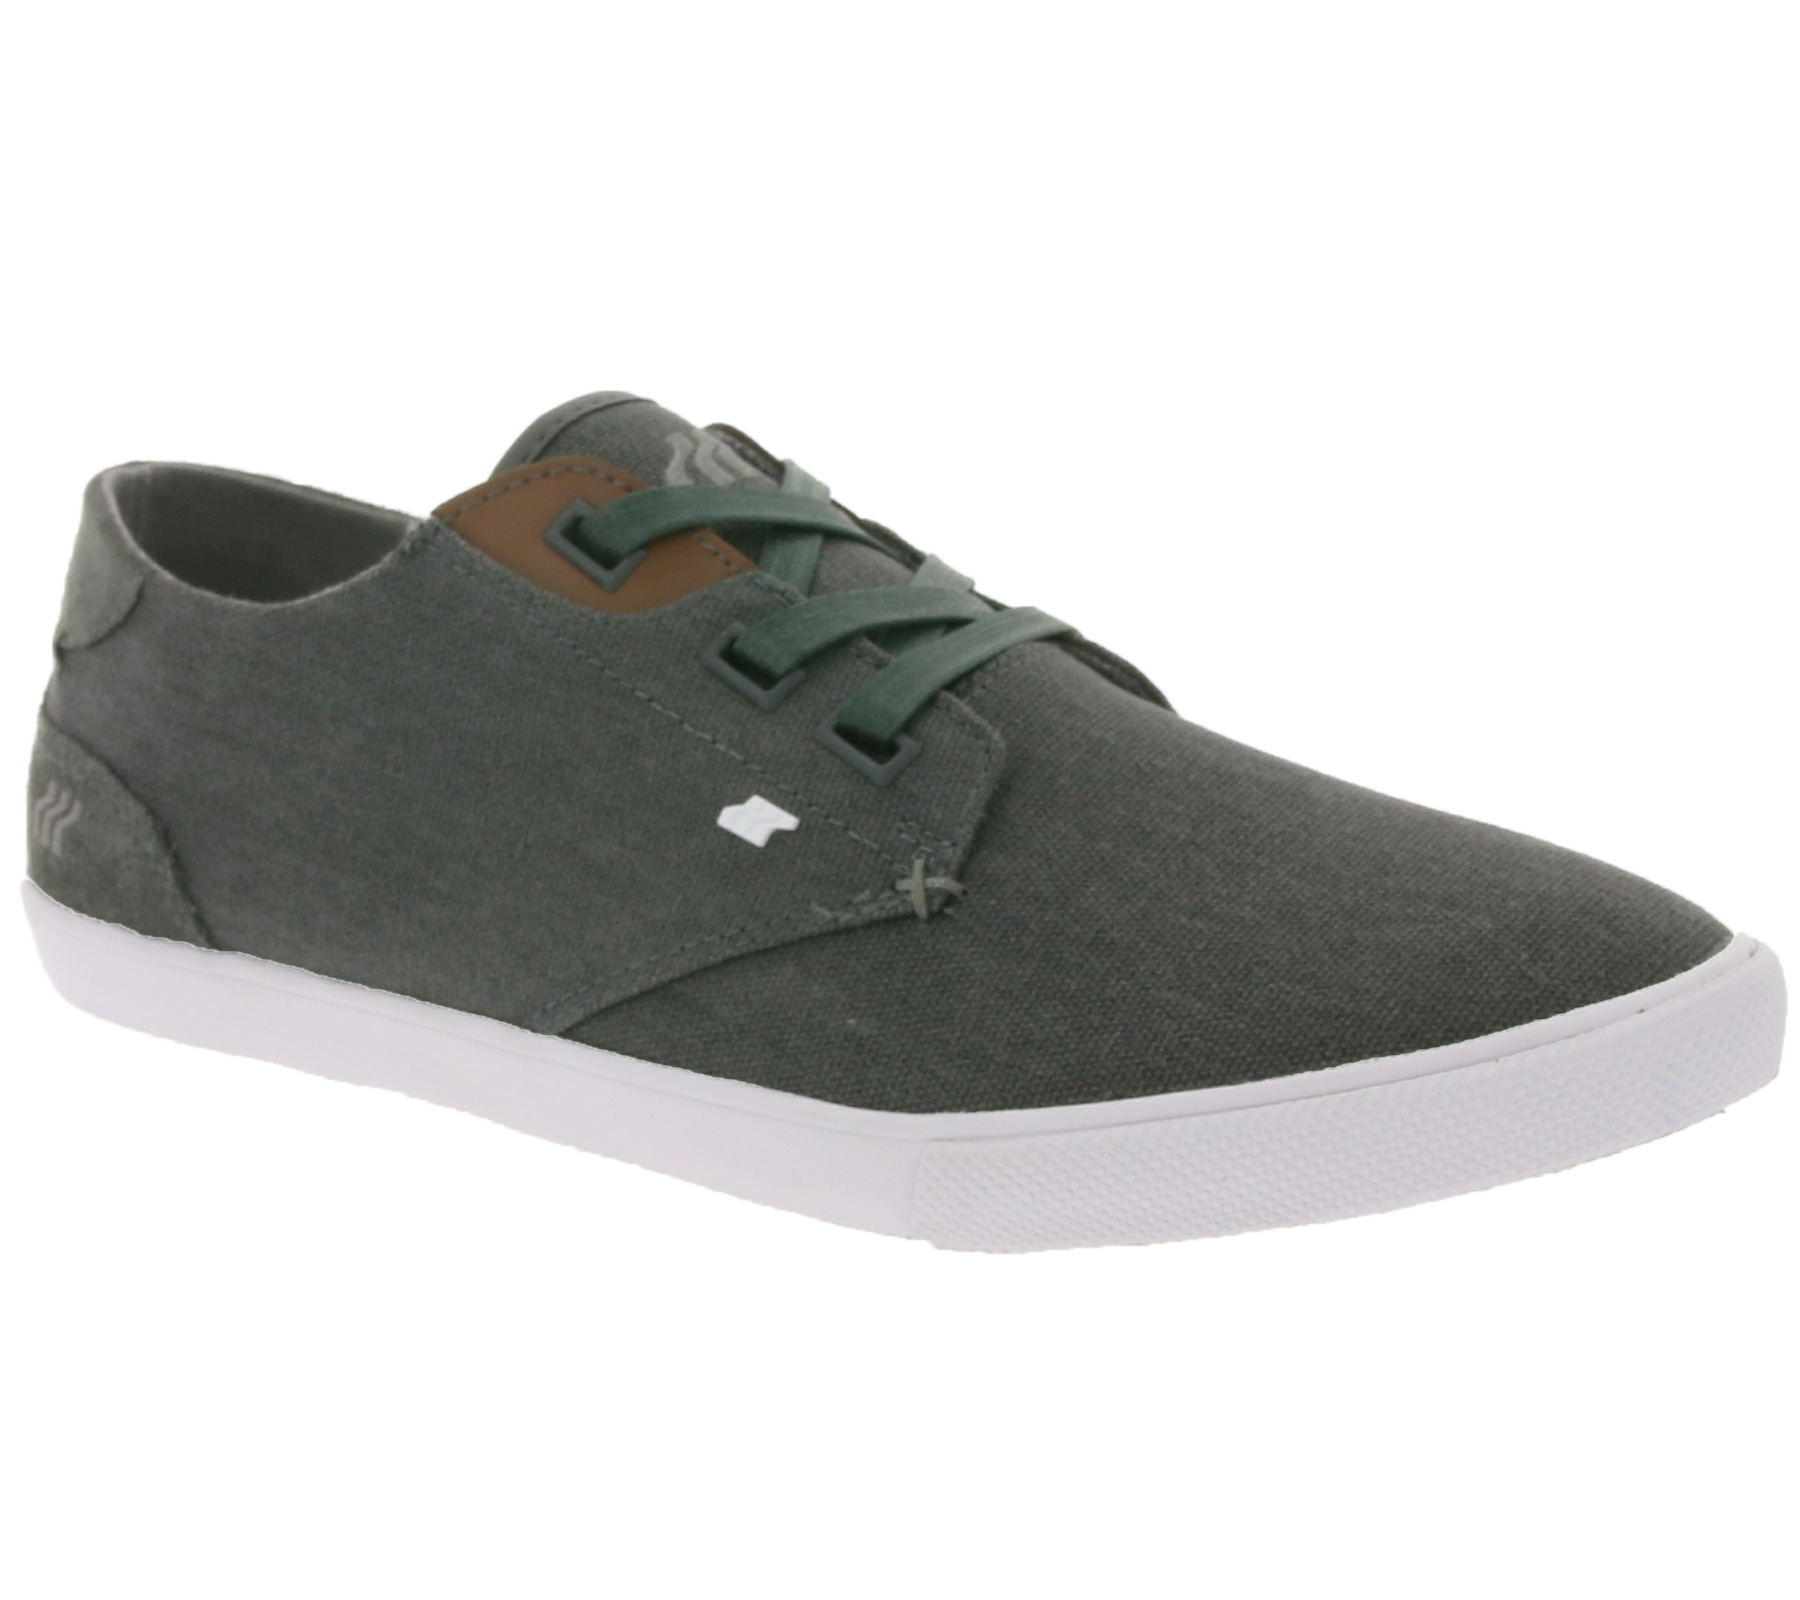 Boxfresh Schuhe schicke Herren Low Top Sneaker Dunkelgrau